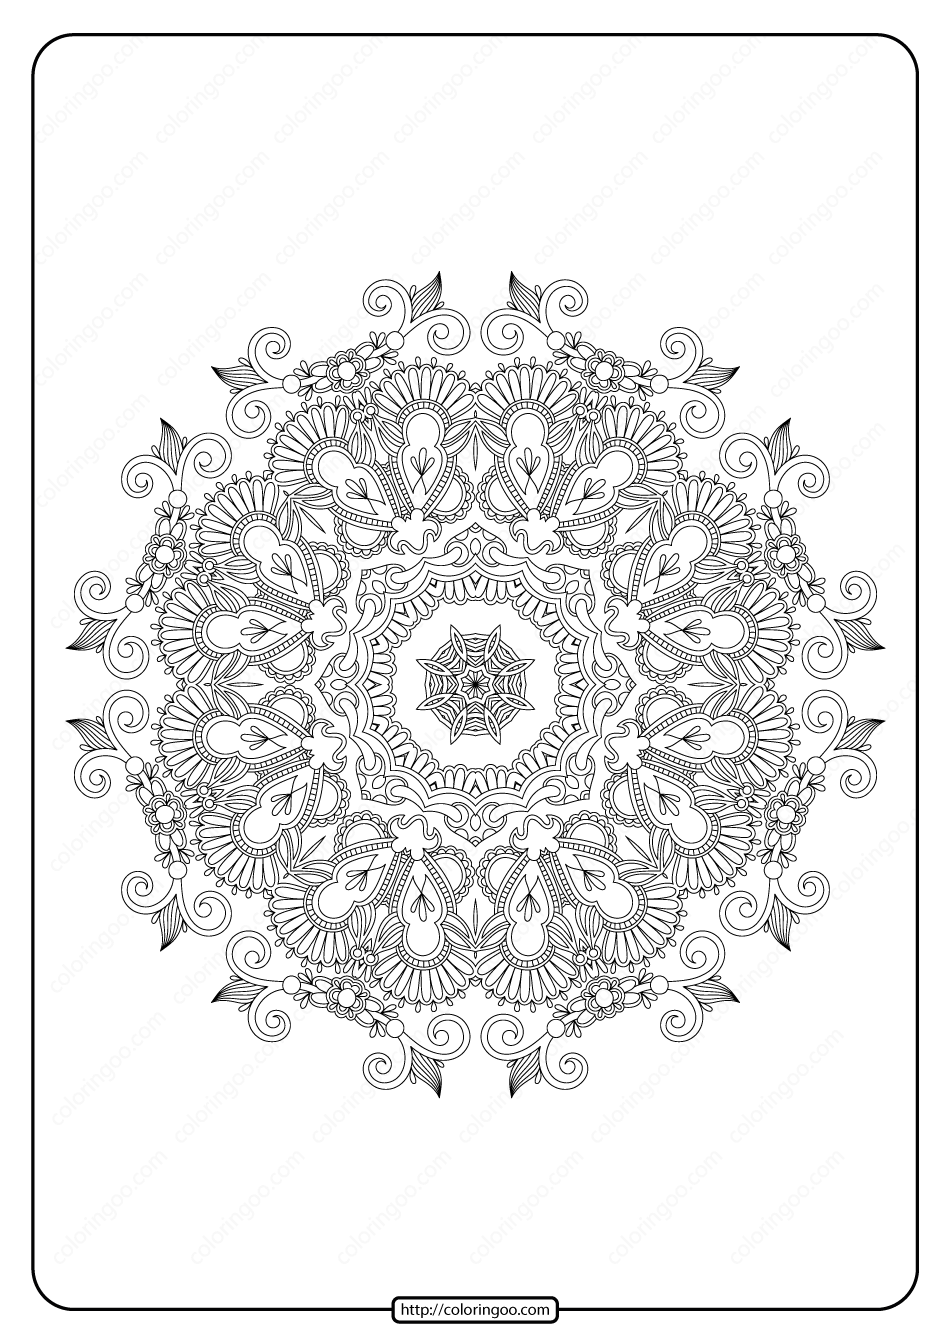 Free Printable Mandala Pattern Coloring Page 40